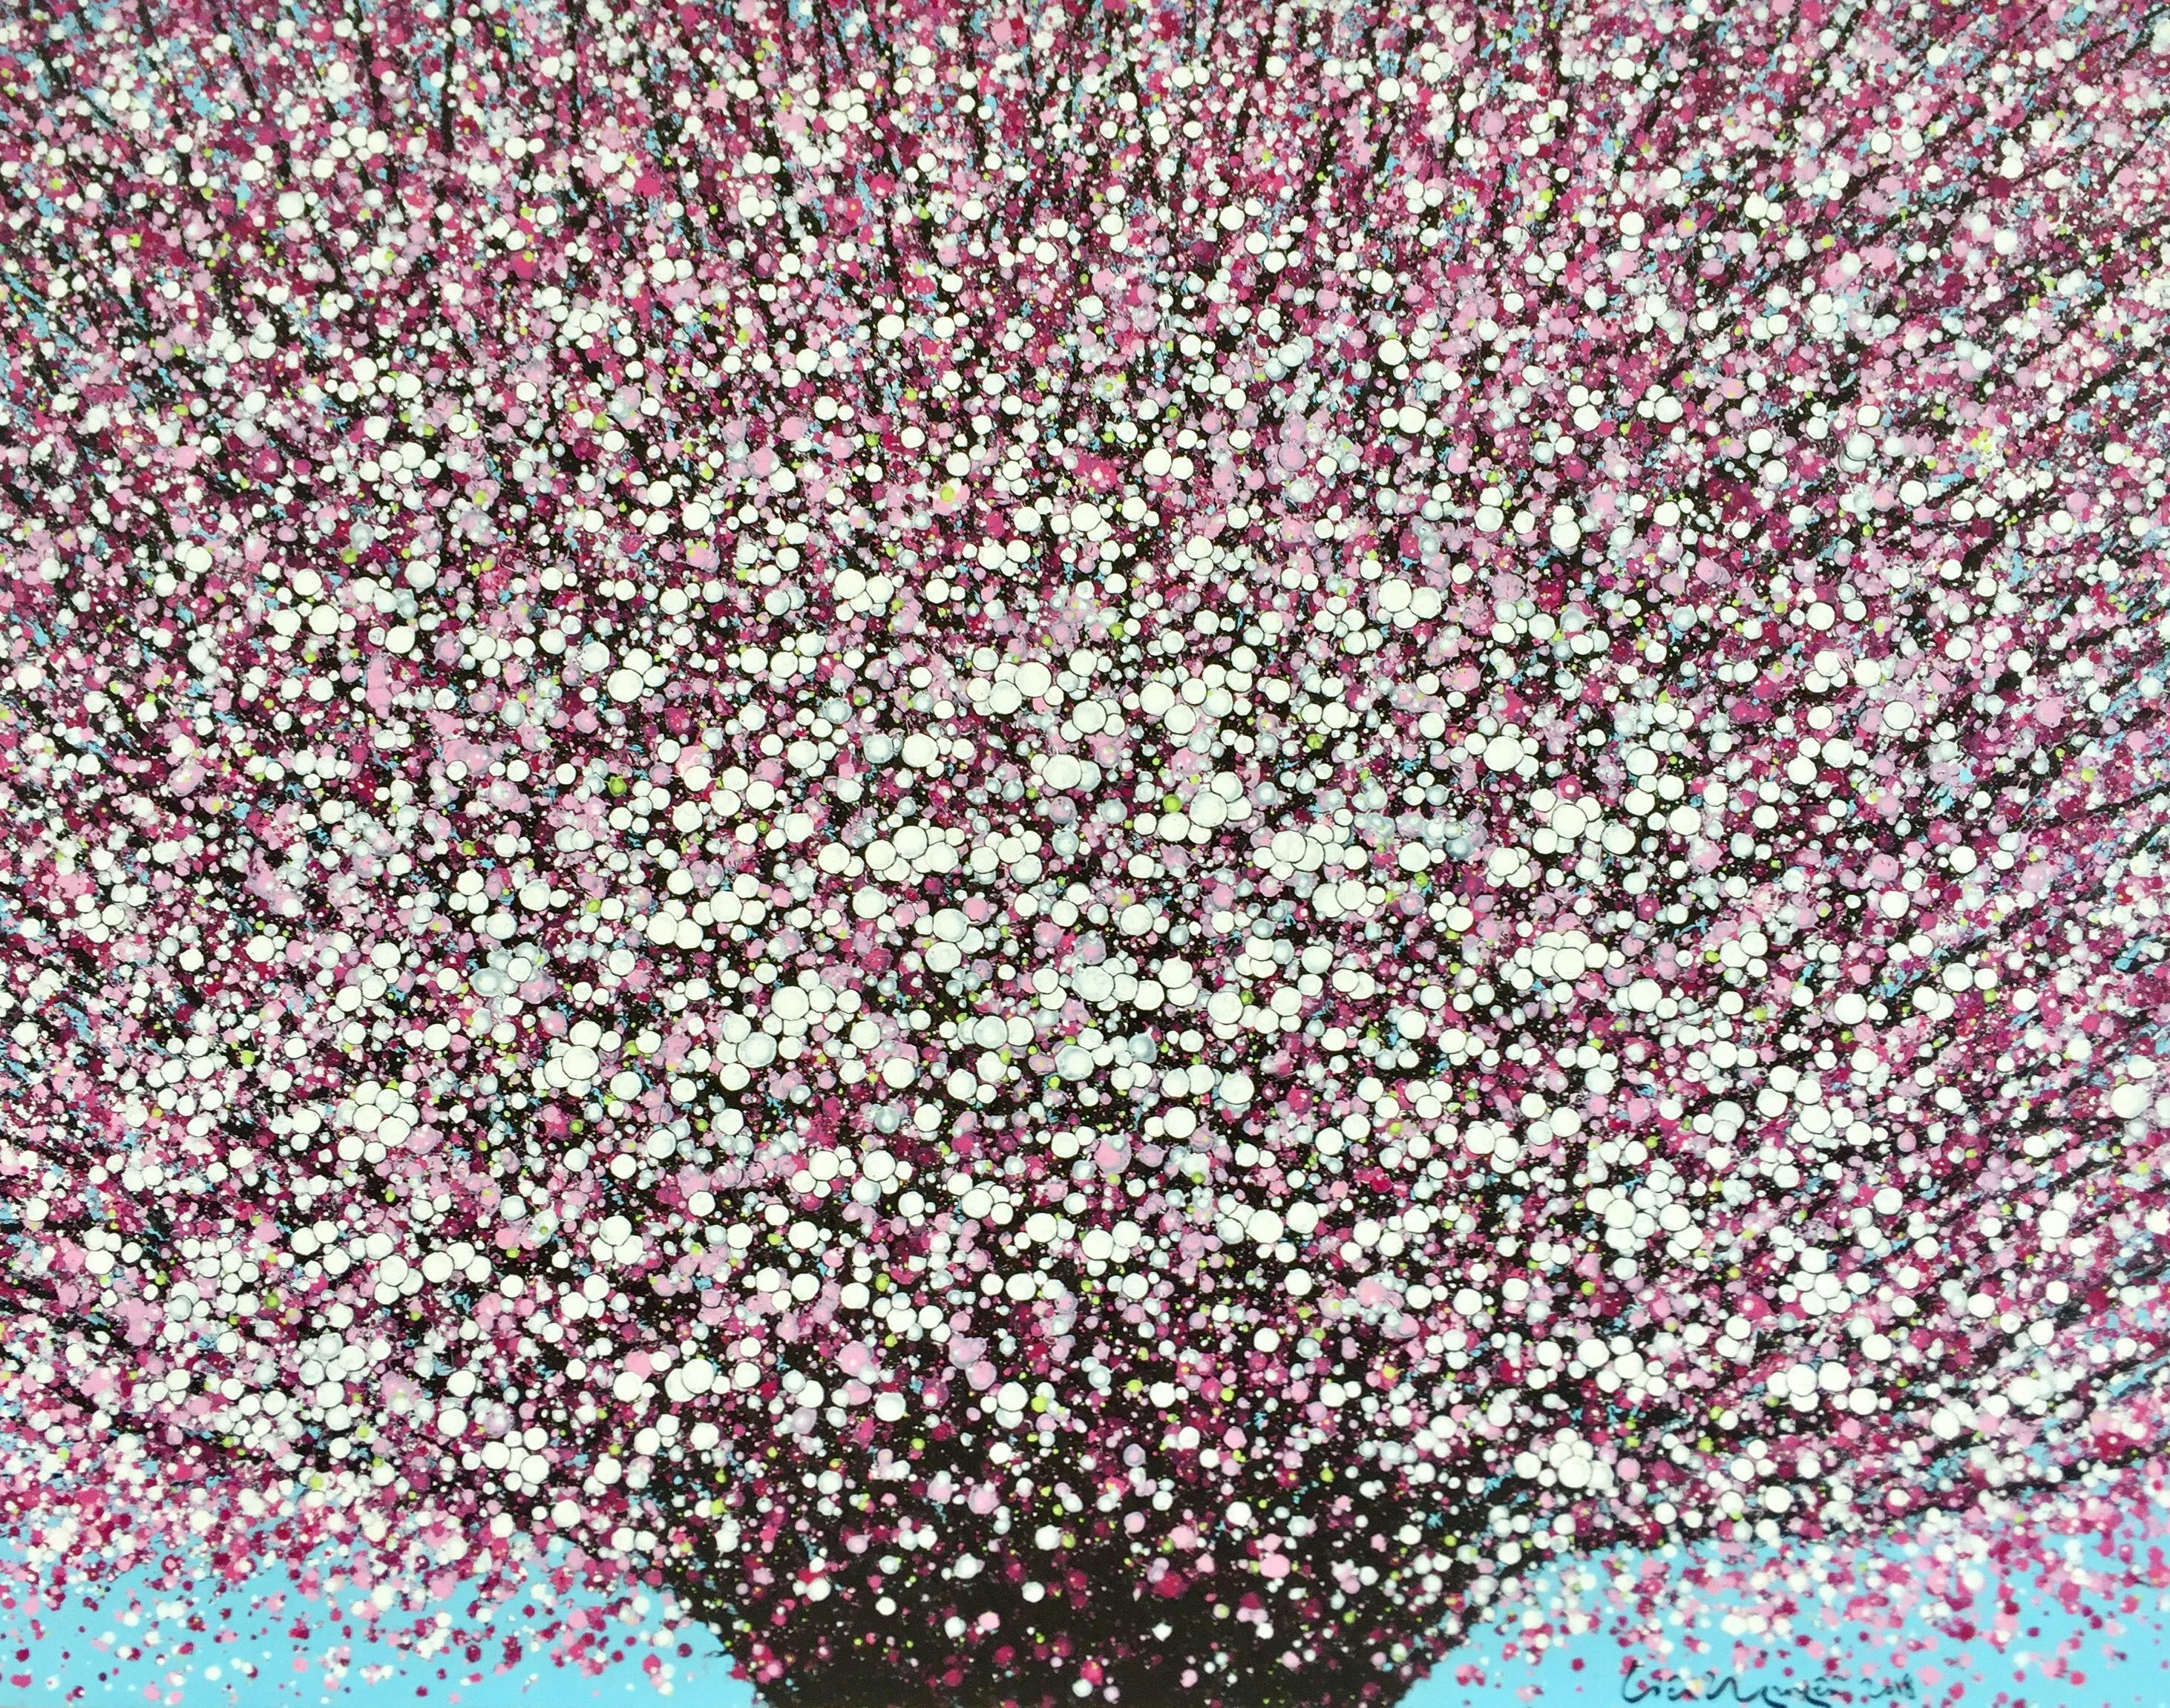 Cherry Blossoms | Hoa Anh Đào